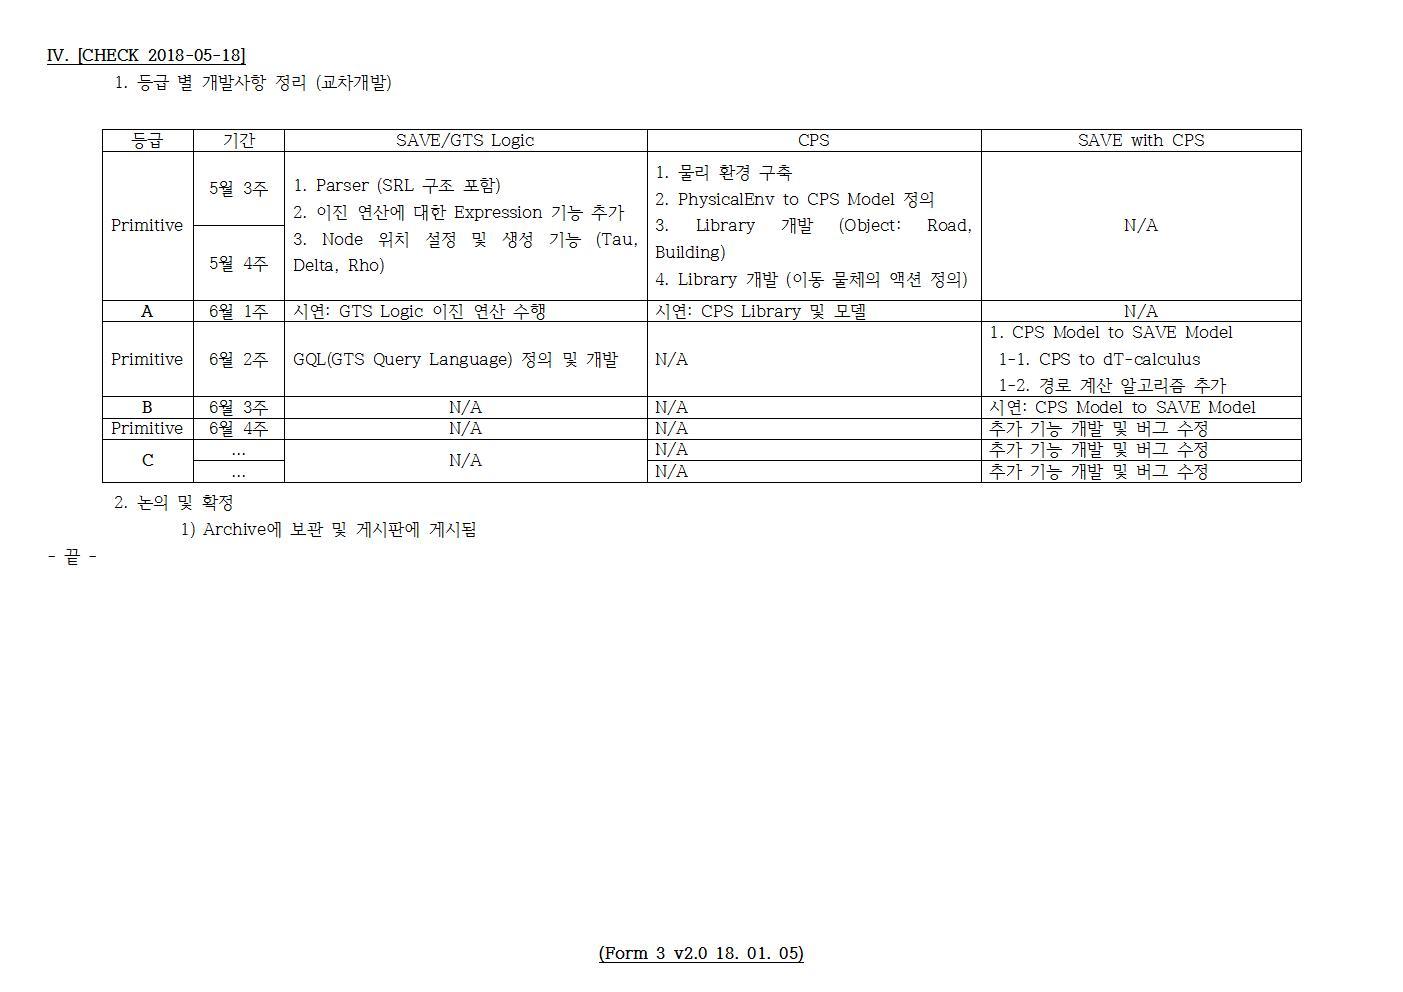 D-[18-001-RD-01]-[SAVE 3.0]-[2018-05-18][SH]003.jpg